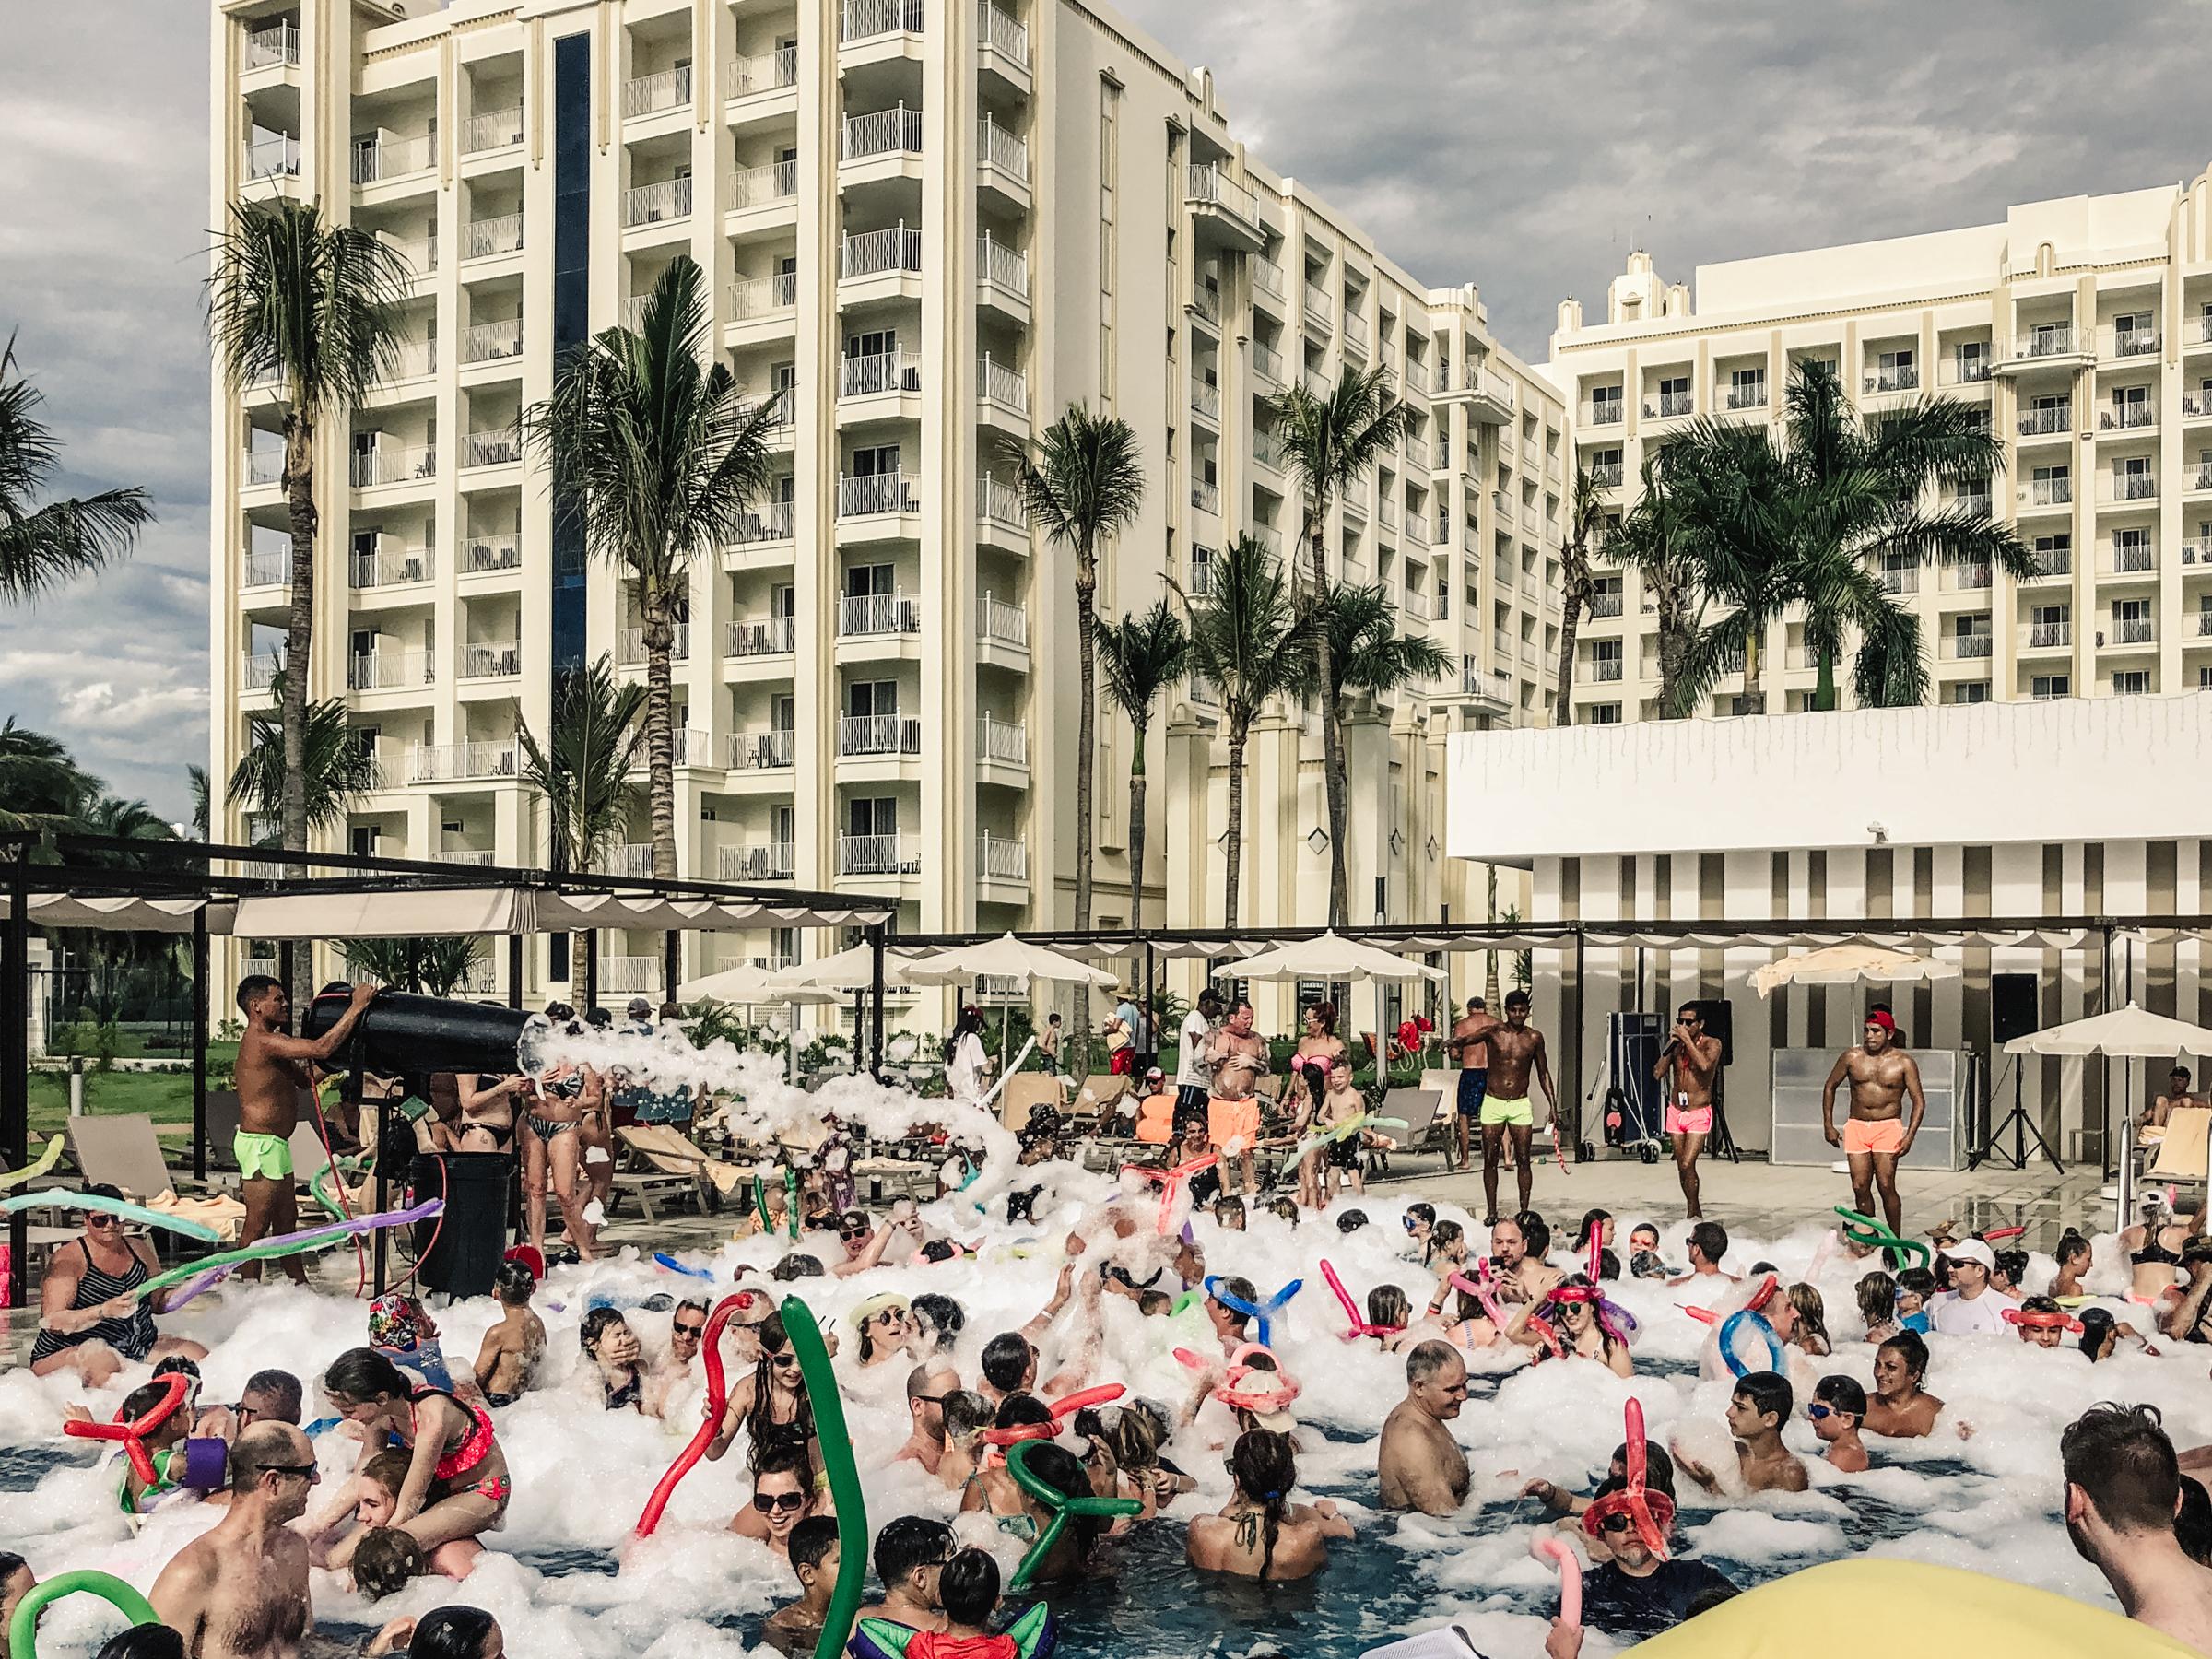 foam soap pool party in Mexica